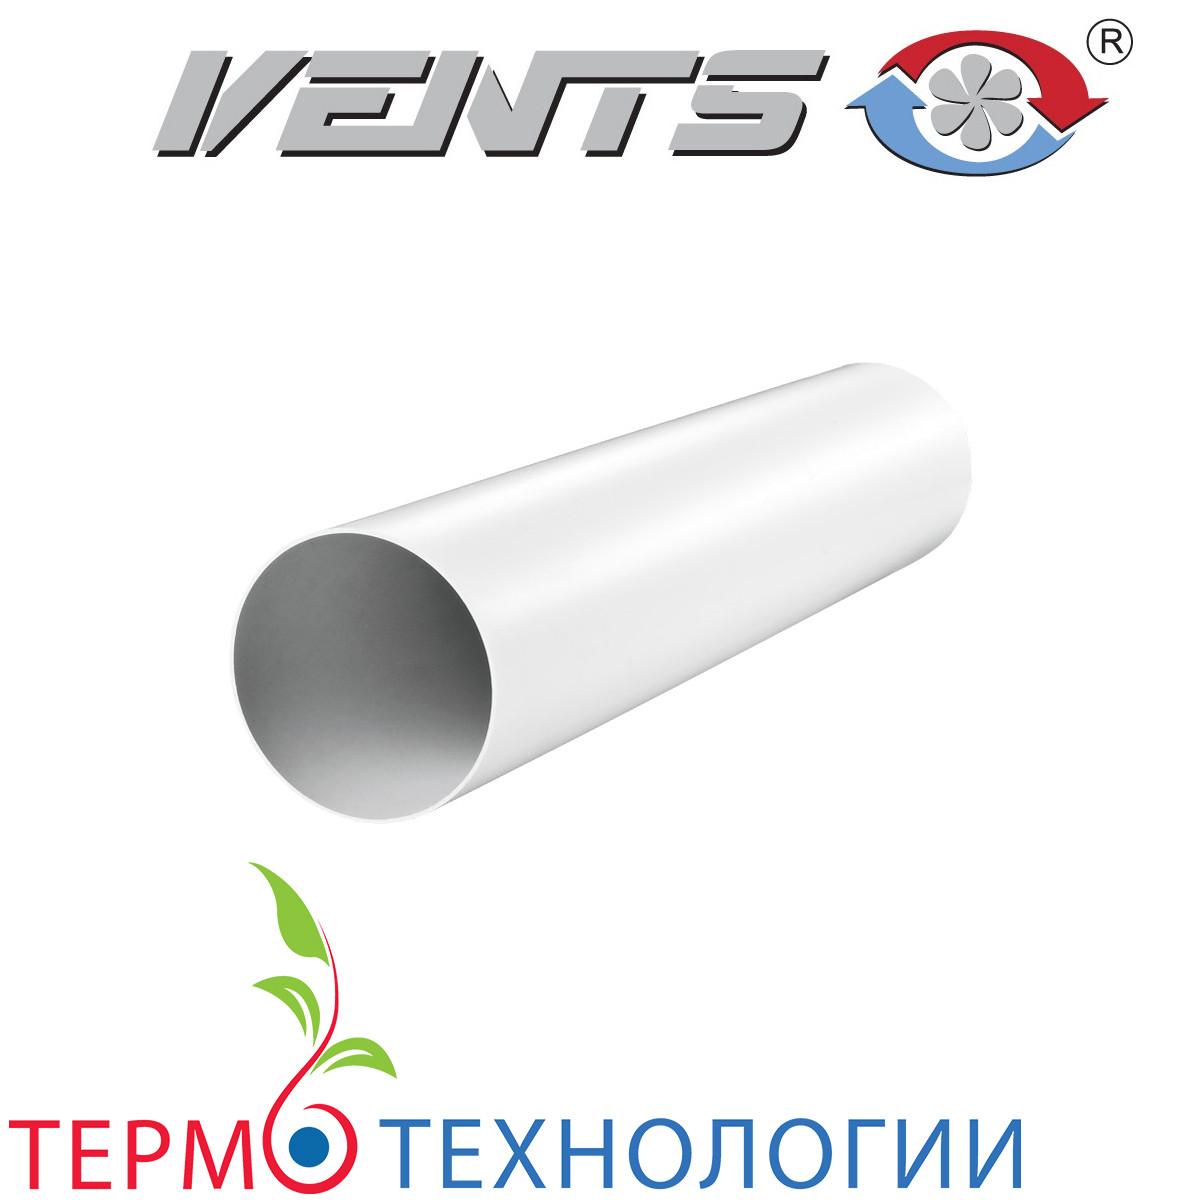 Канал для монтажа в стену Vents 700 мм